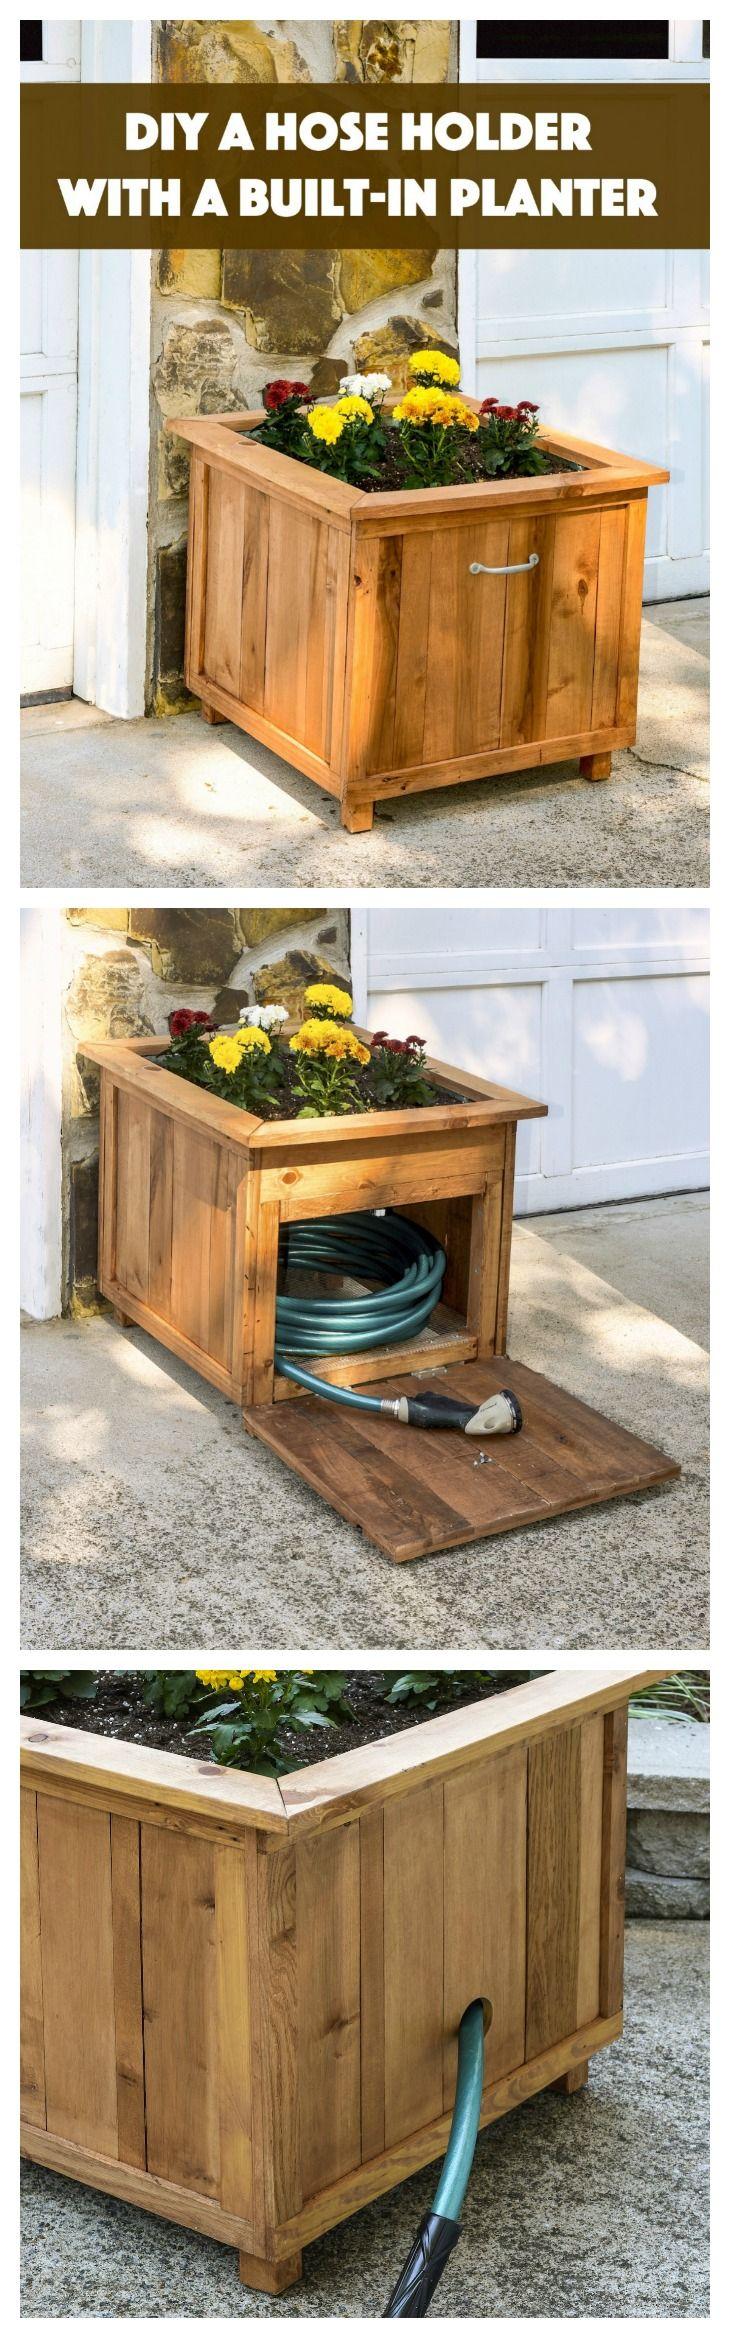 1312 best Creative Crafting & DIY images on Pinterest | Furniture ...